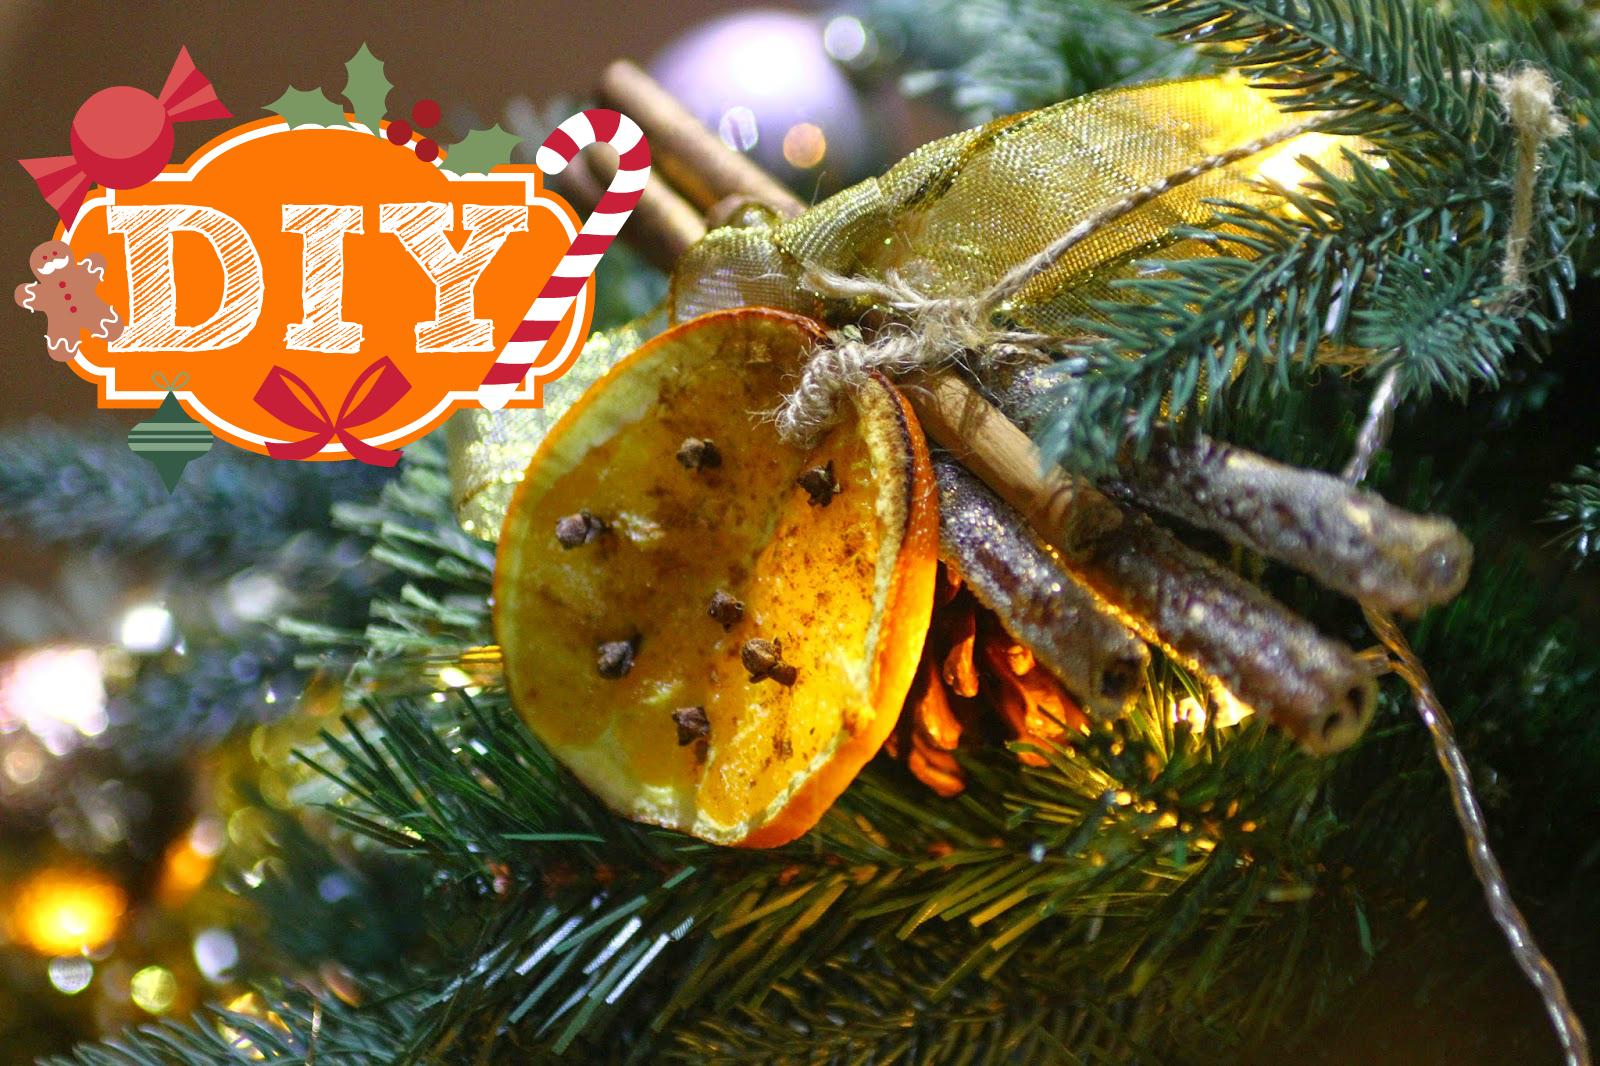 above watch my diy cinnamon orange christmas tree decorations video